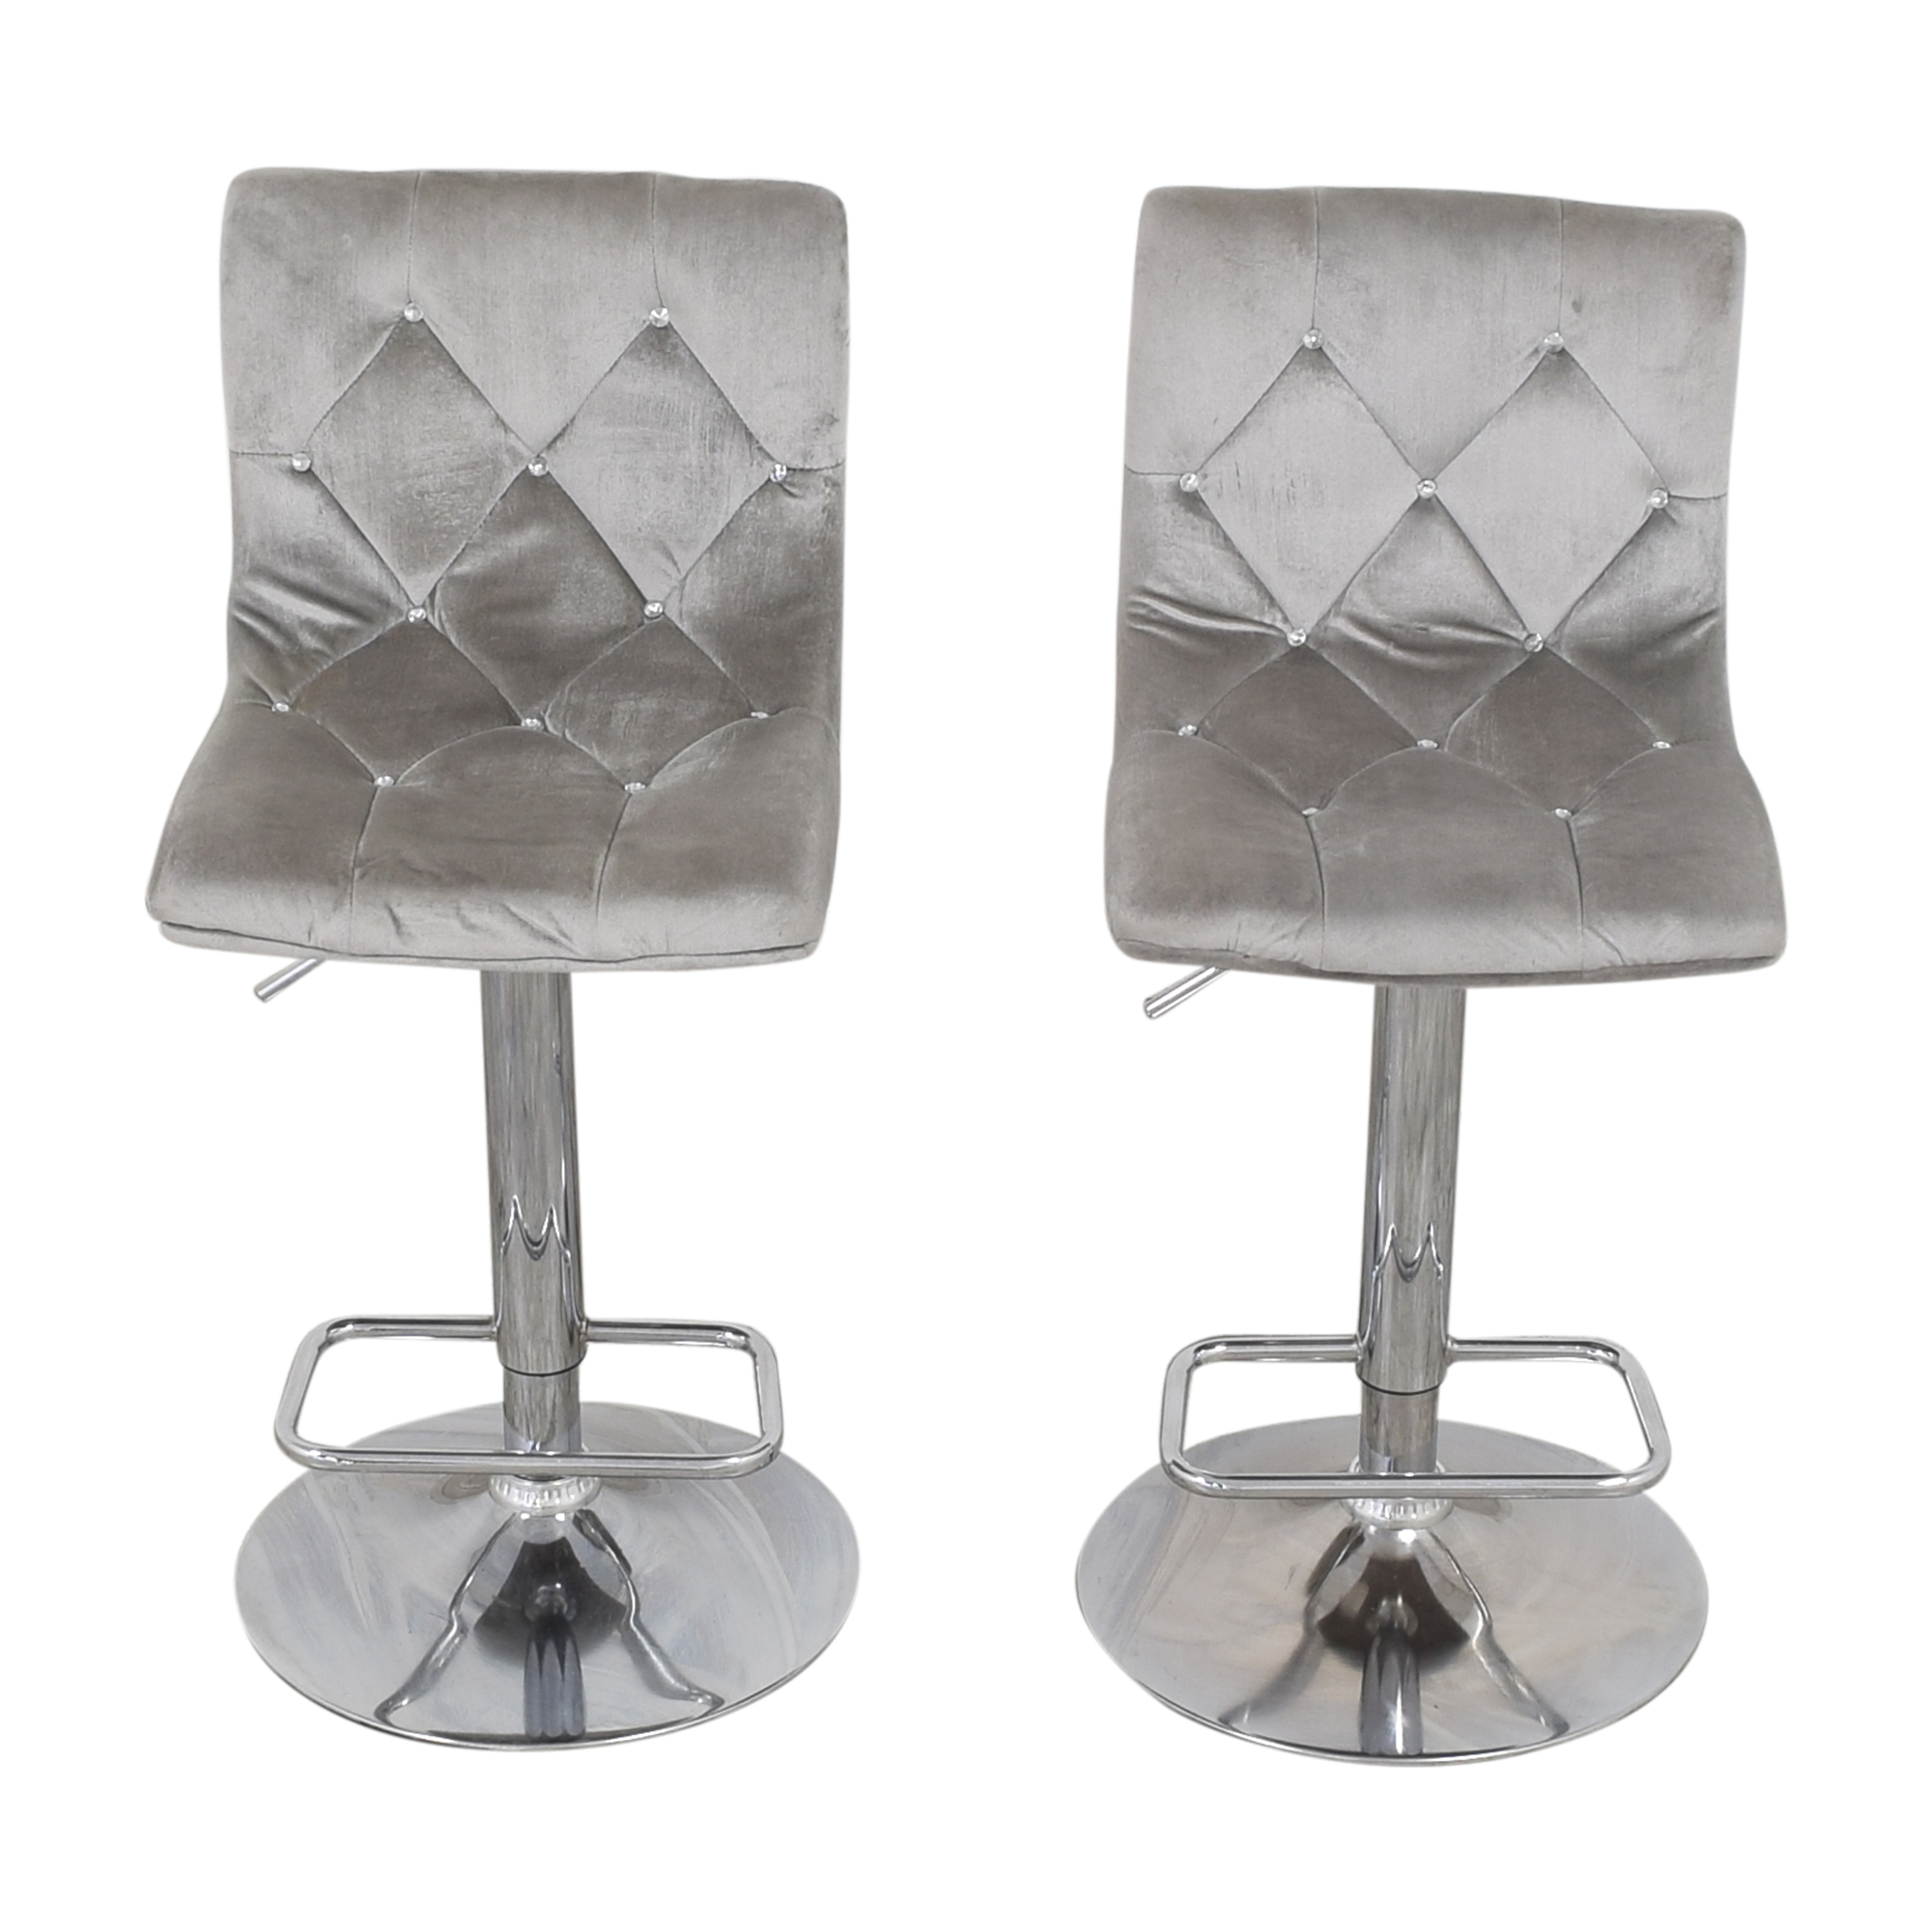 Diamond-Tufted Swivel Bar Stools / Chairs